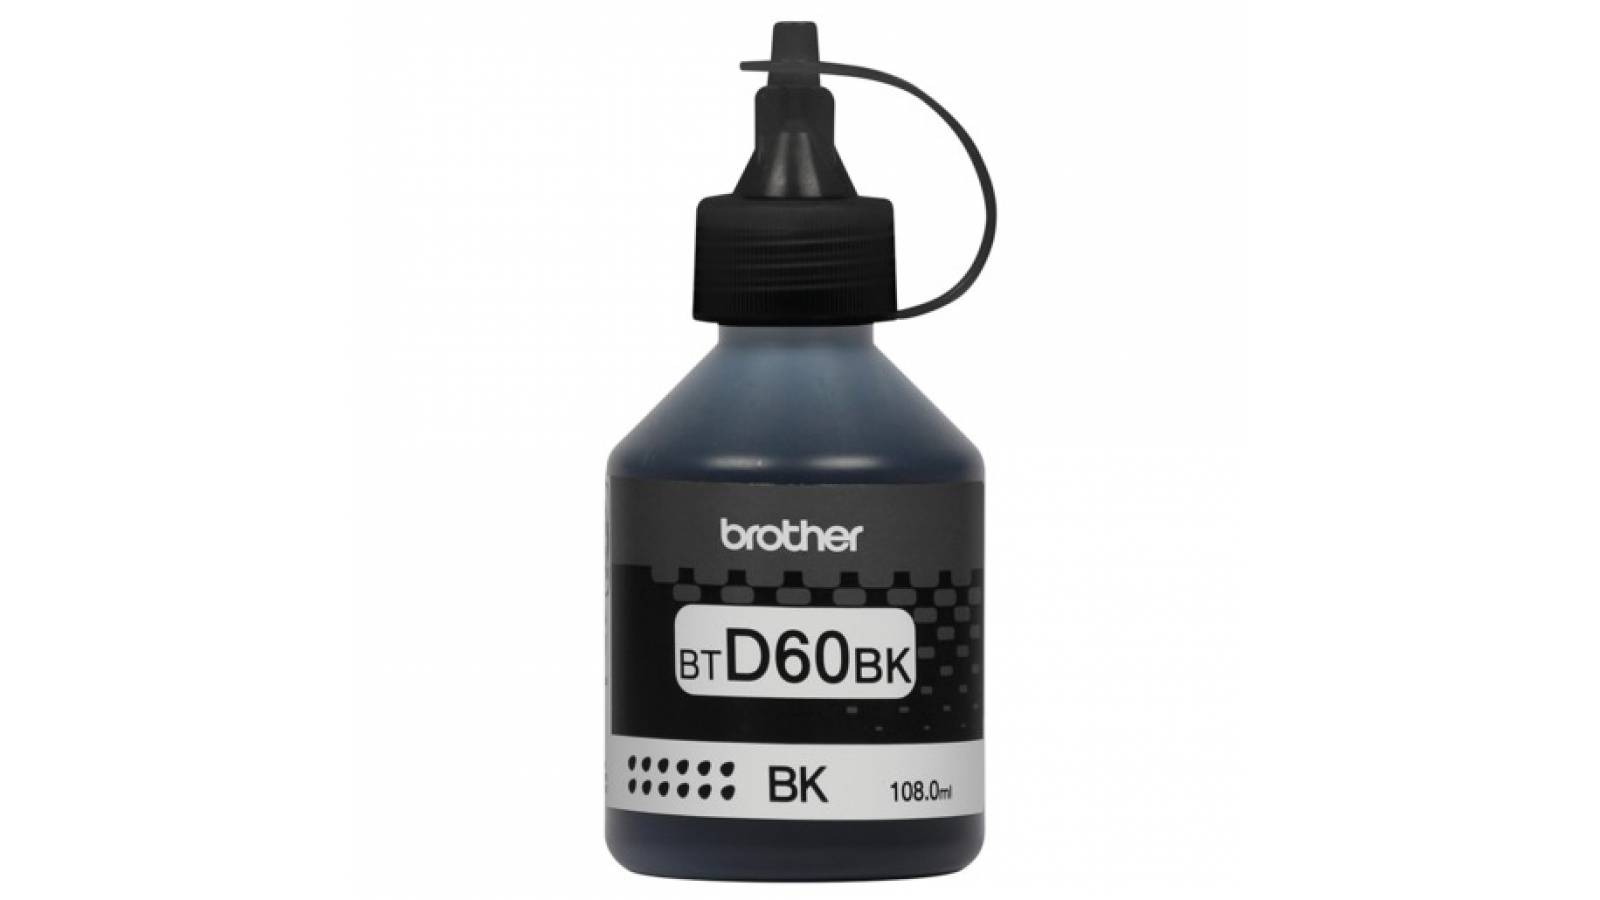 Botella de tinta Brother BT-D60BK para sistema continuo